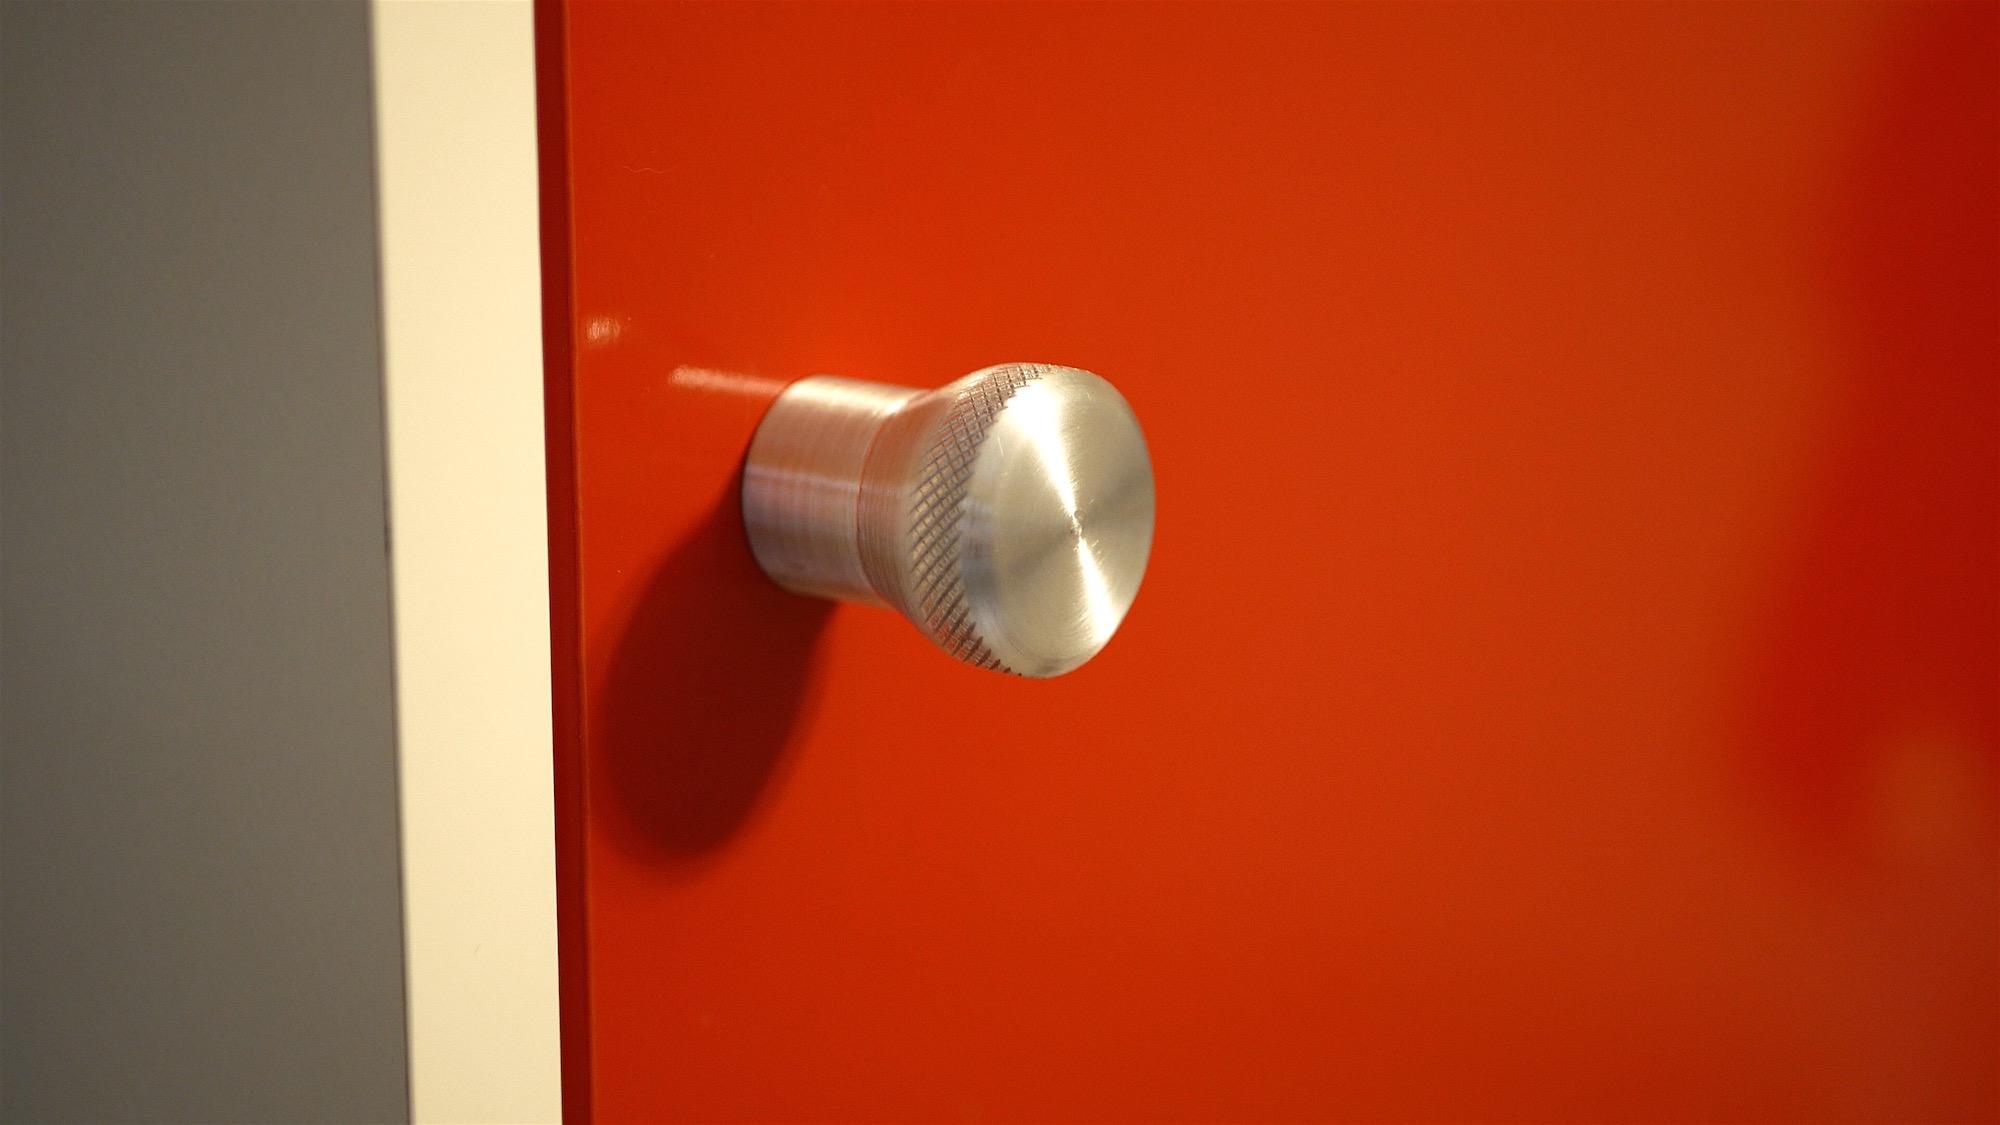 aluminum-knob-metal-lathe-shifter